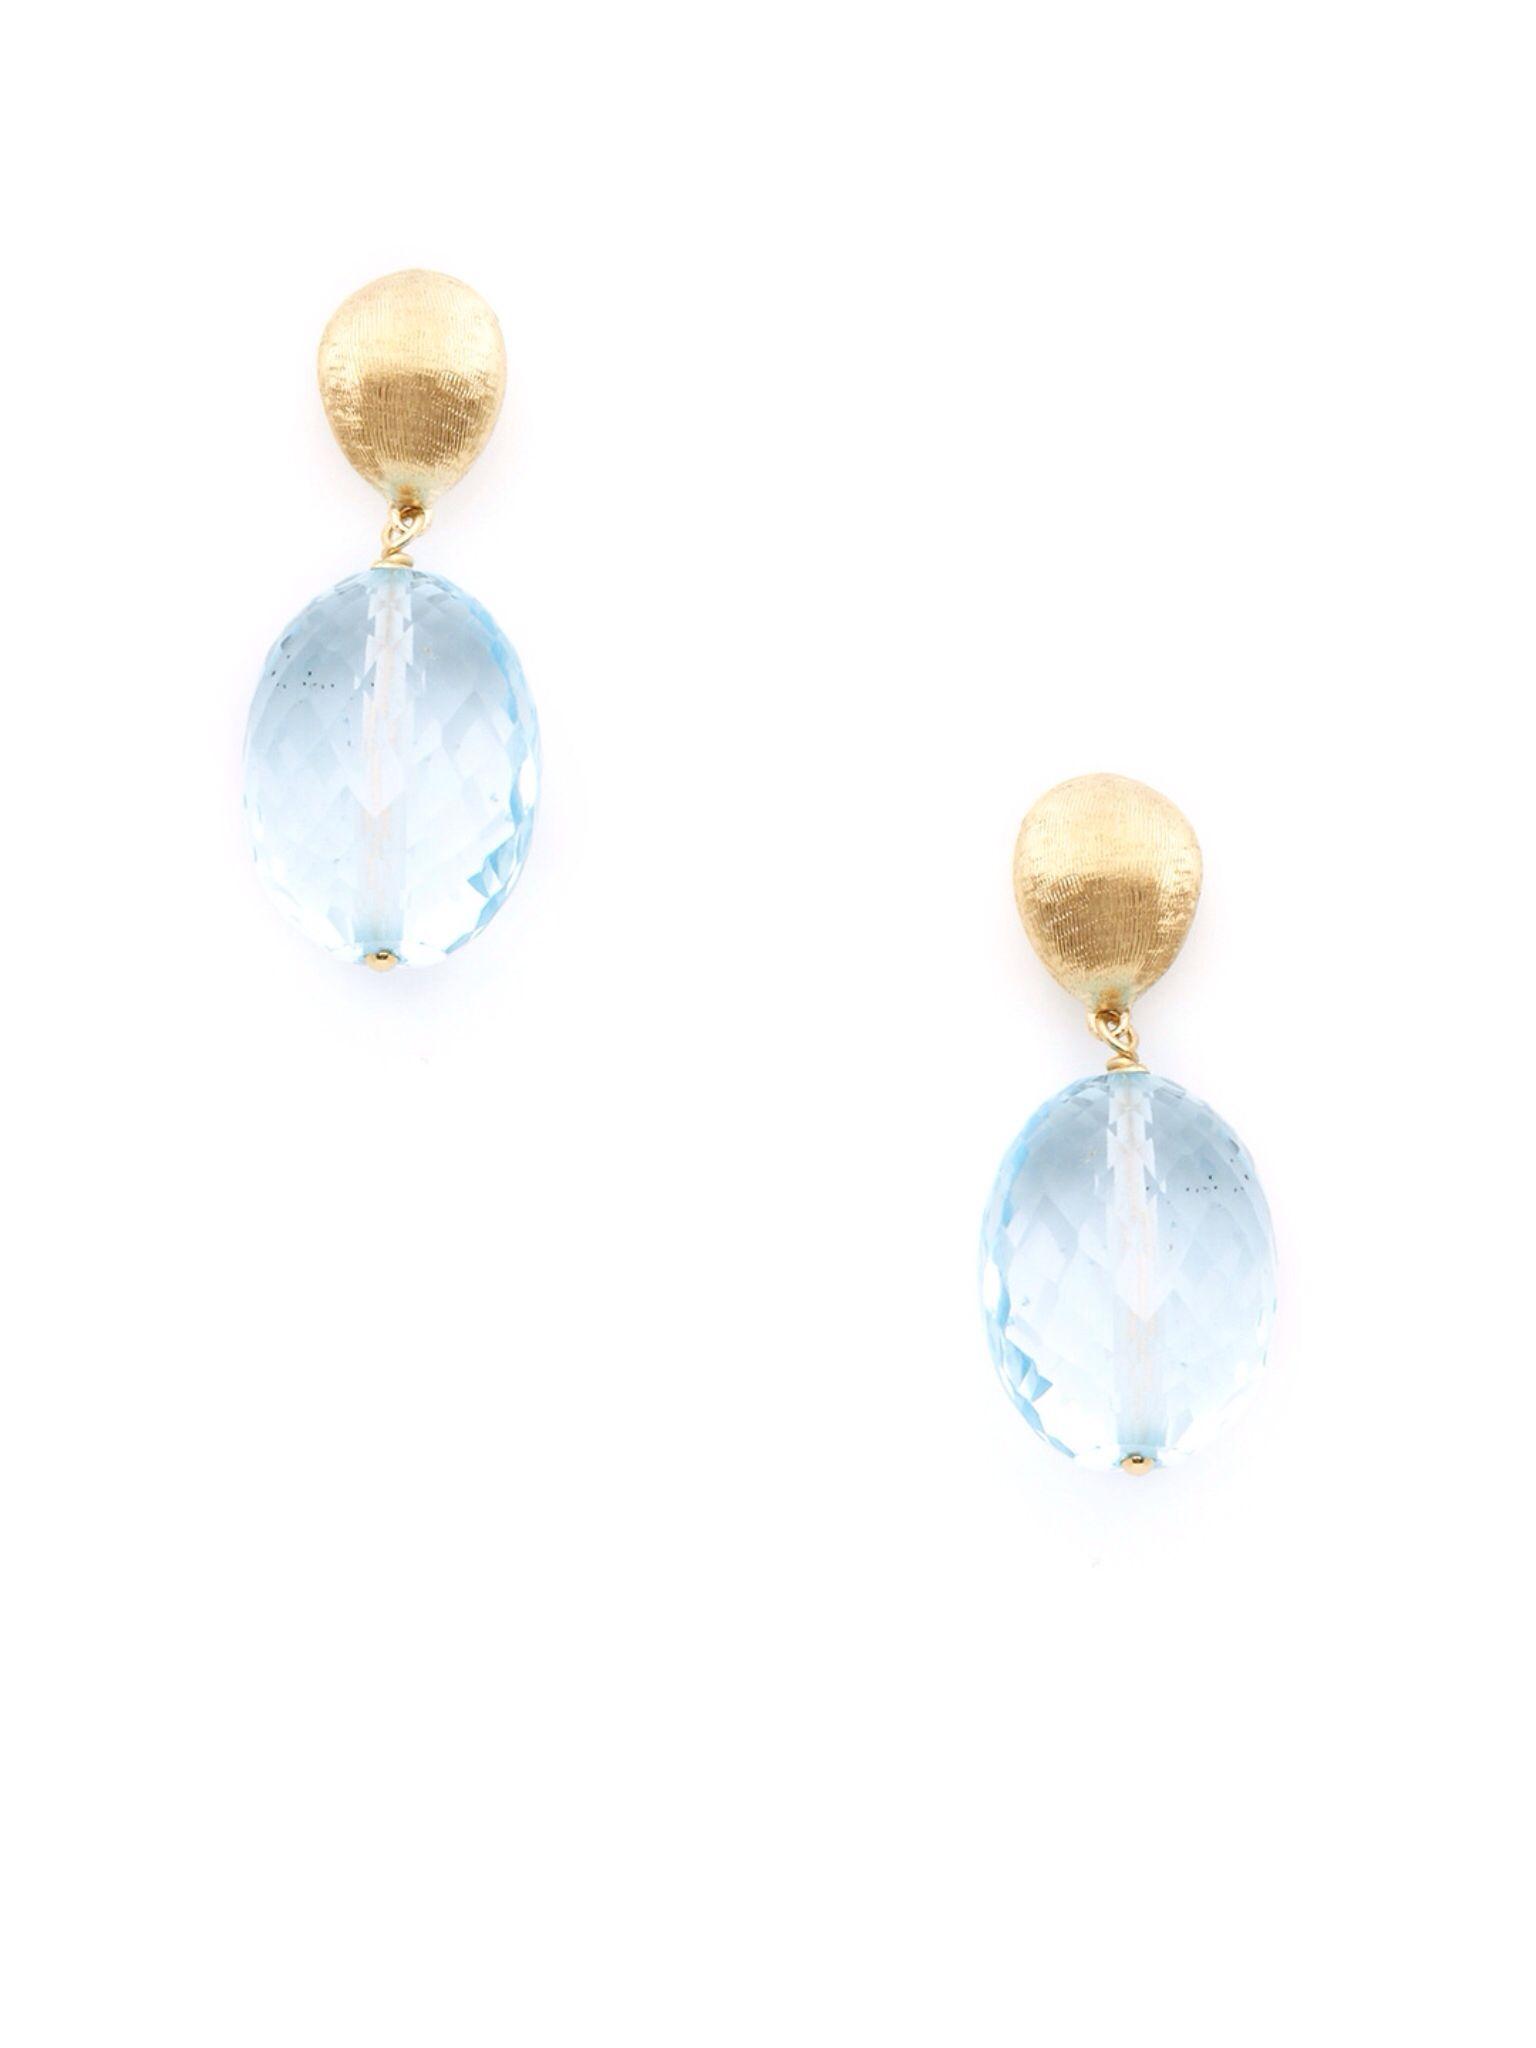 Marco Bicego Philadelphia topaz earrings